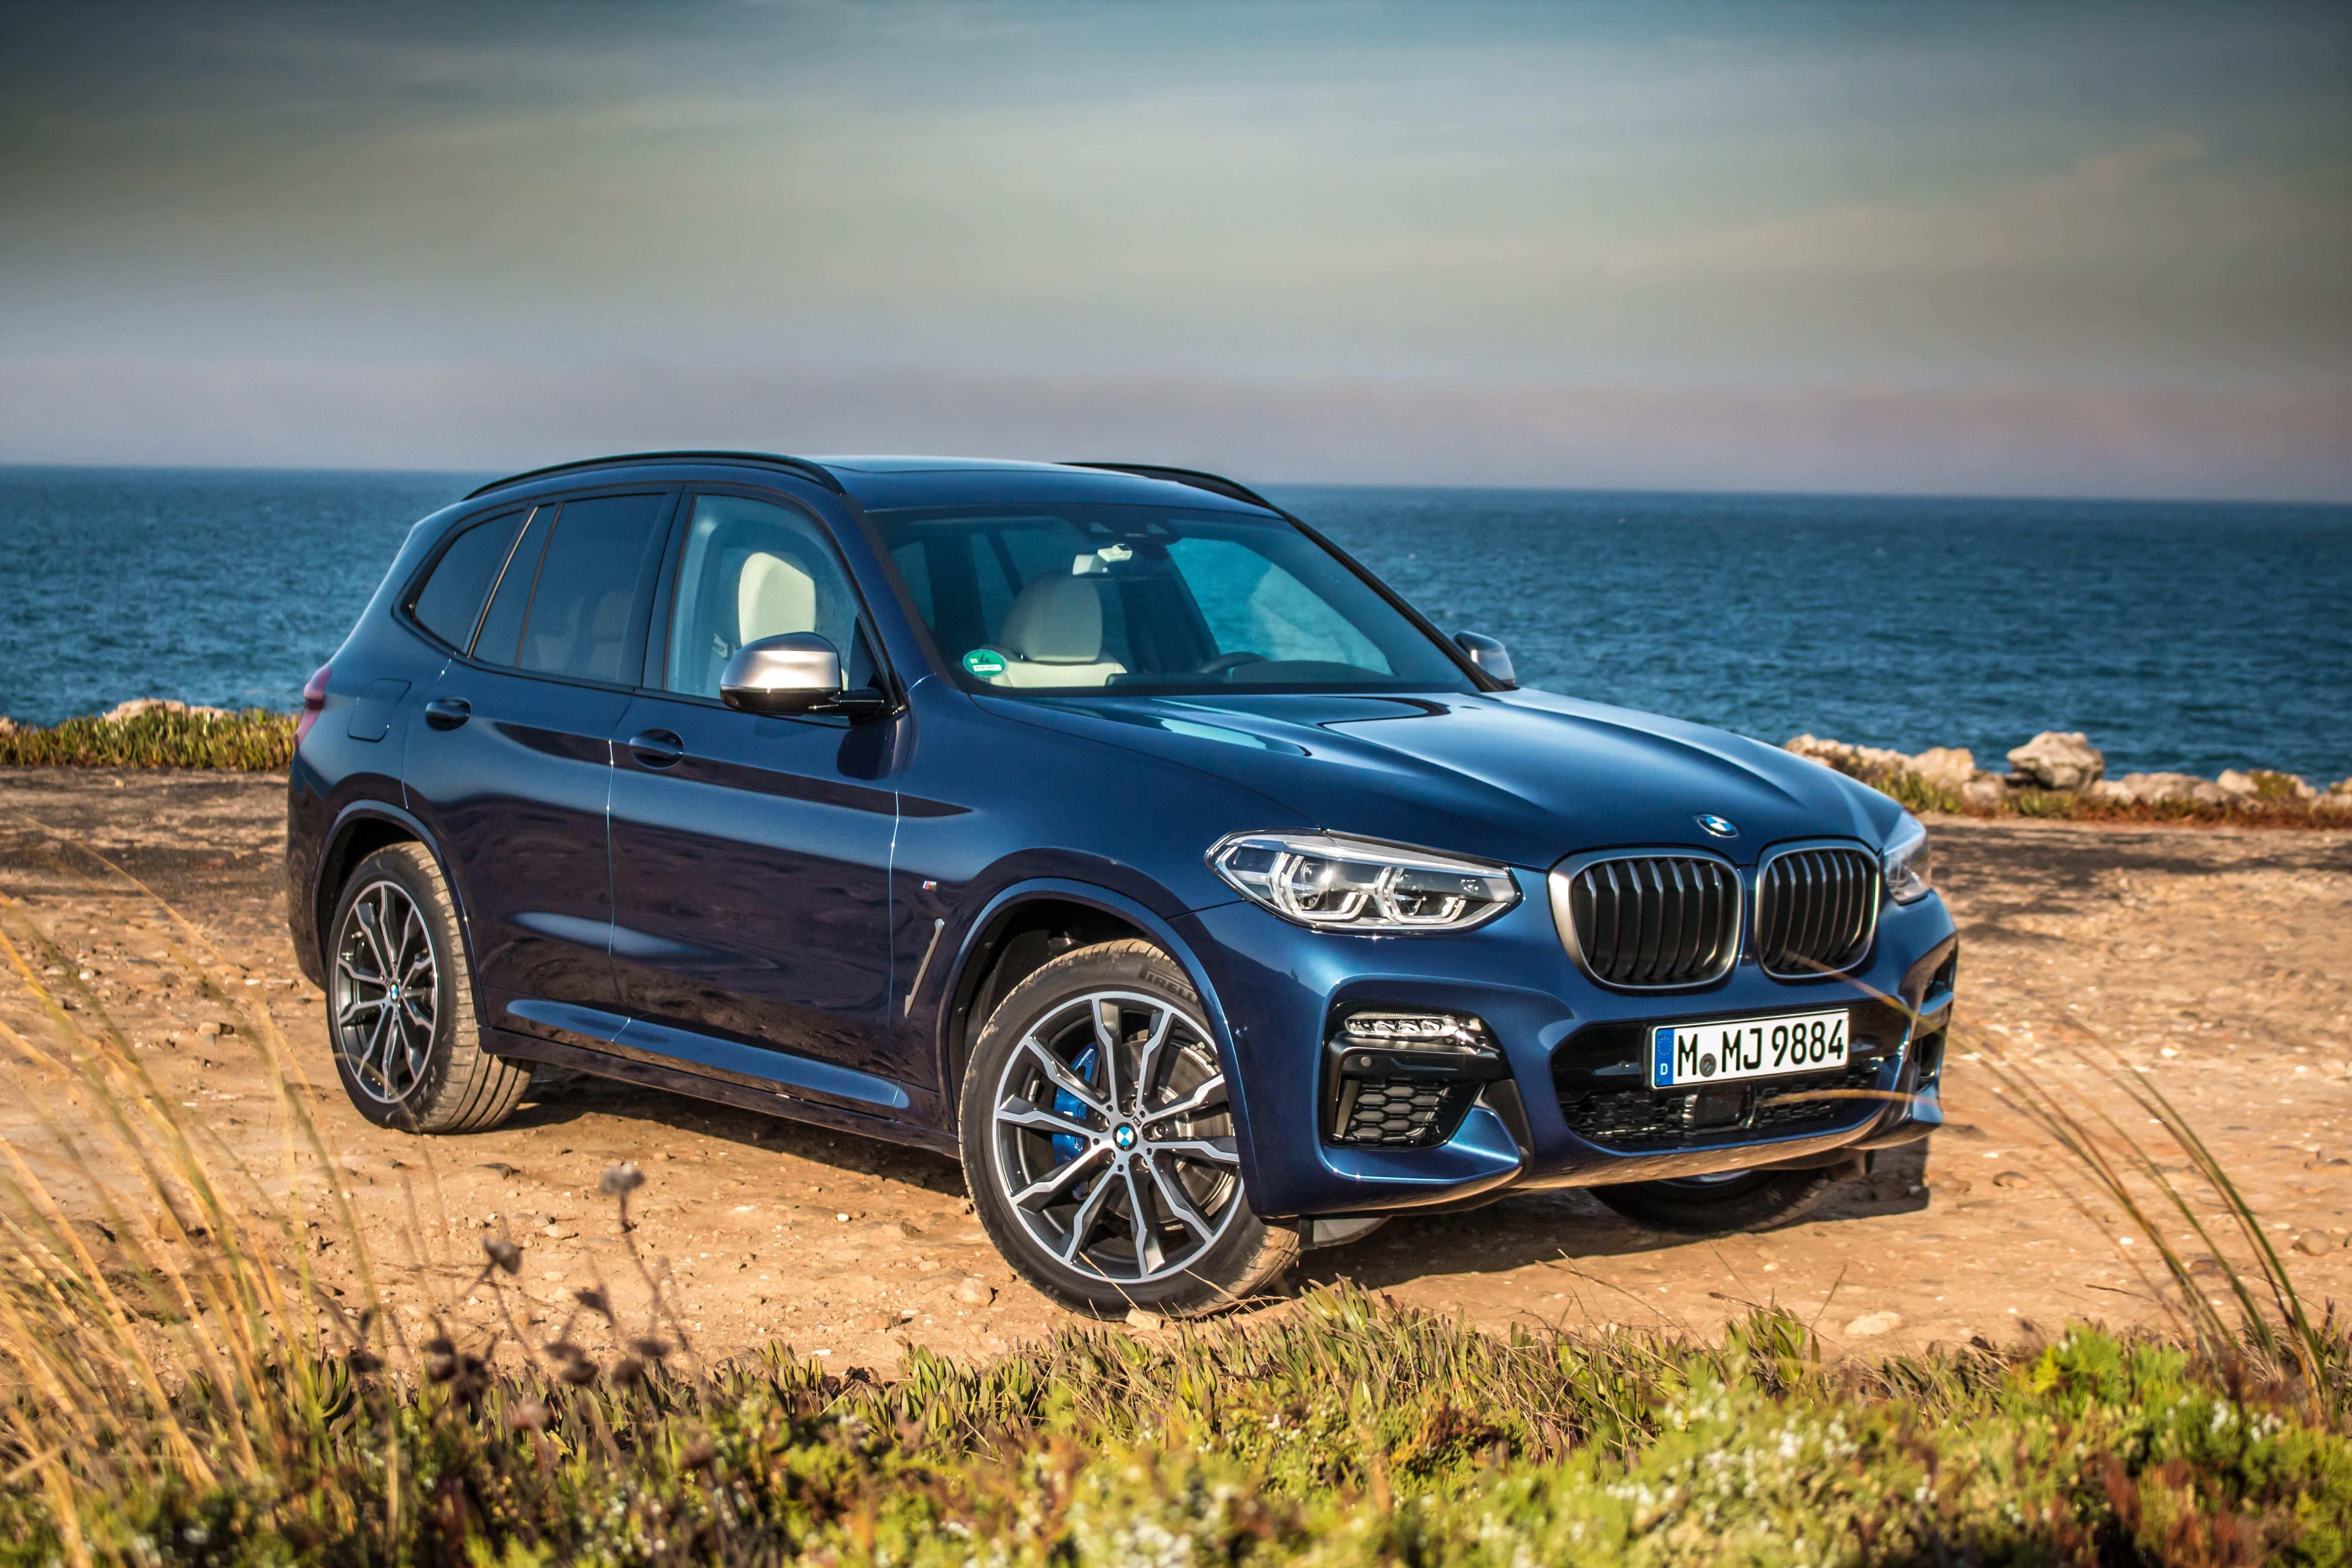 13 All New 2020 BMW X3 Hybrid New Concept by 2020 BMW X3 Hybrid